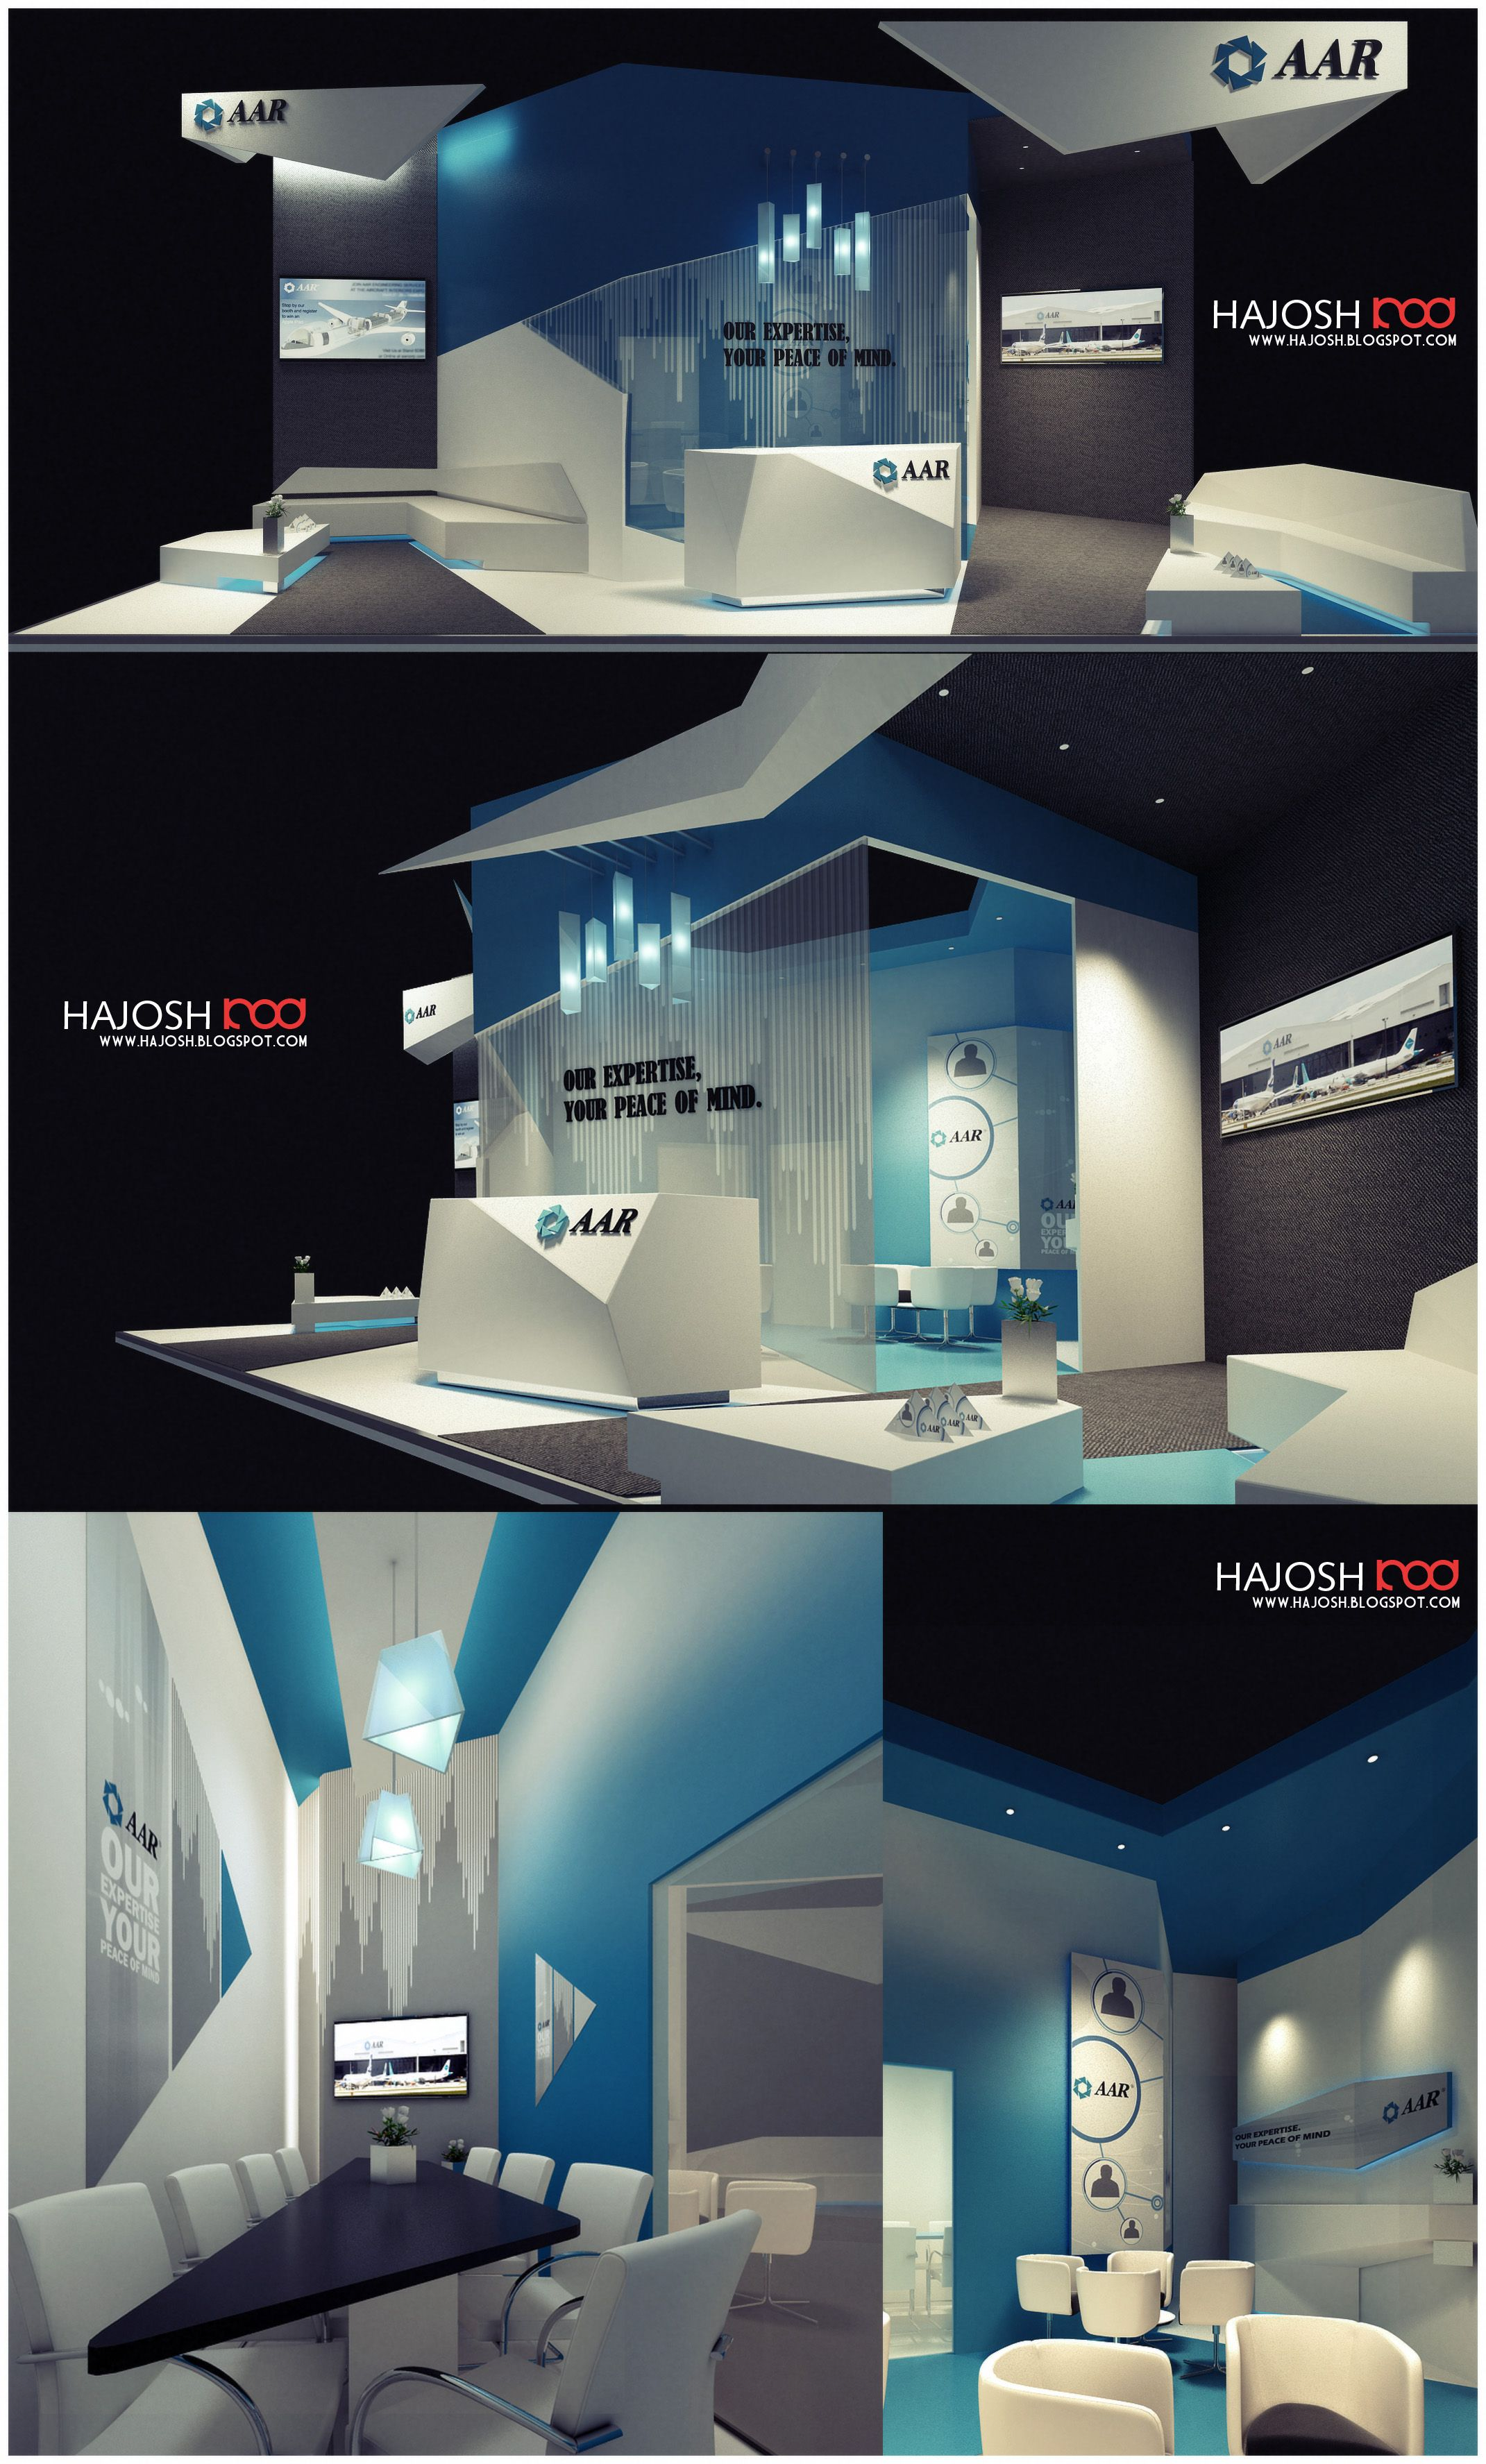 D Exhibition Jobs In Dubai : Aar exhibition design dubai airshow exhibiton